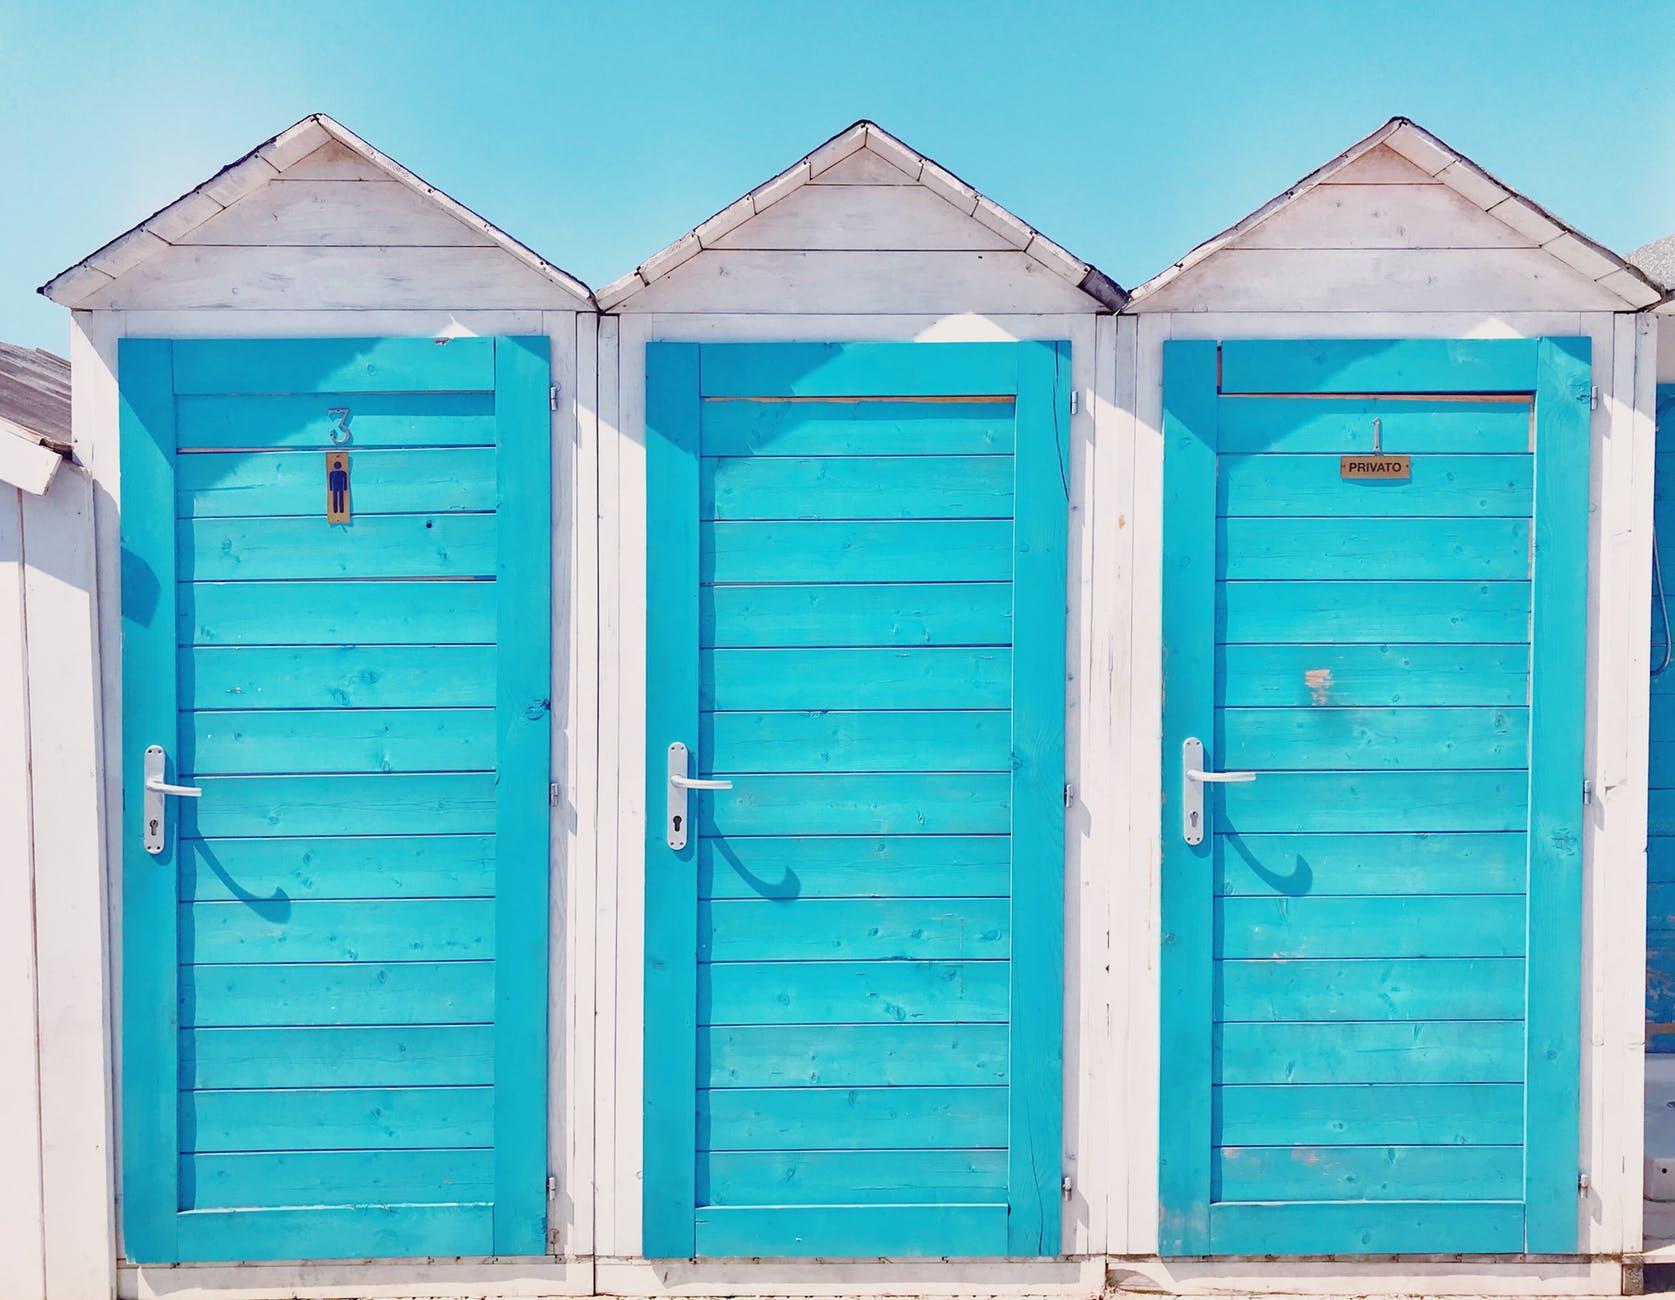 photo of three wooden toilets